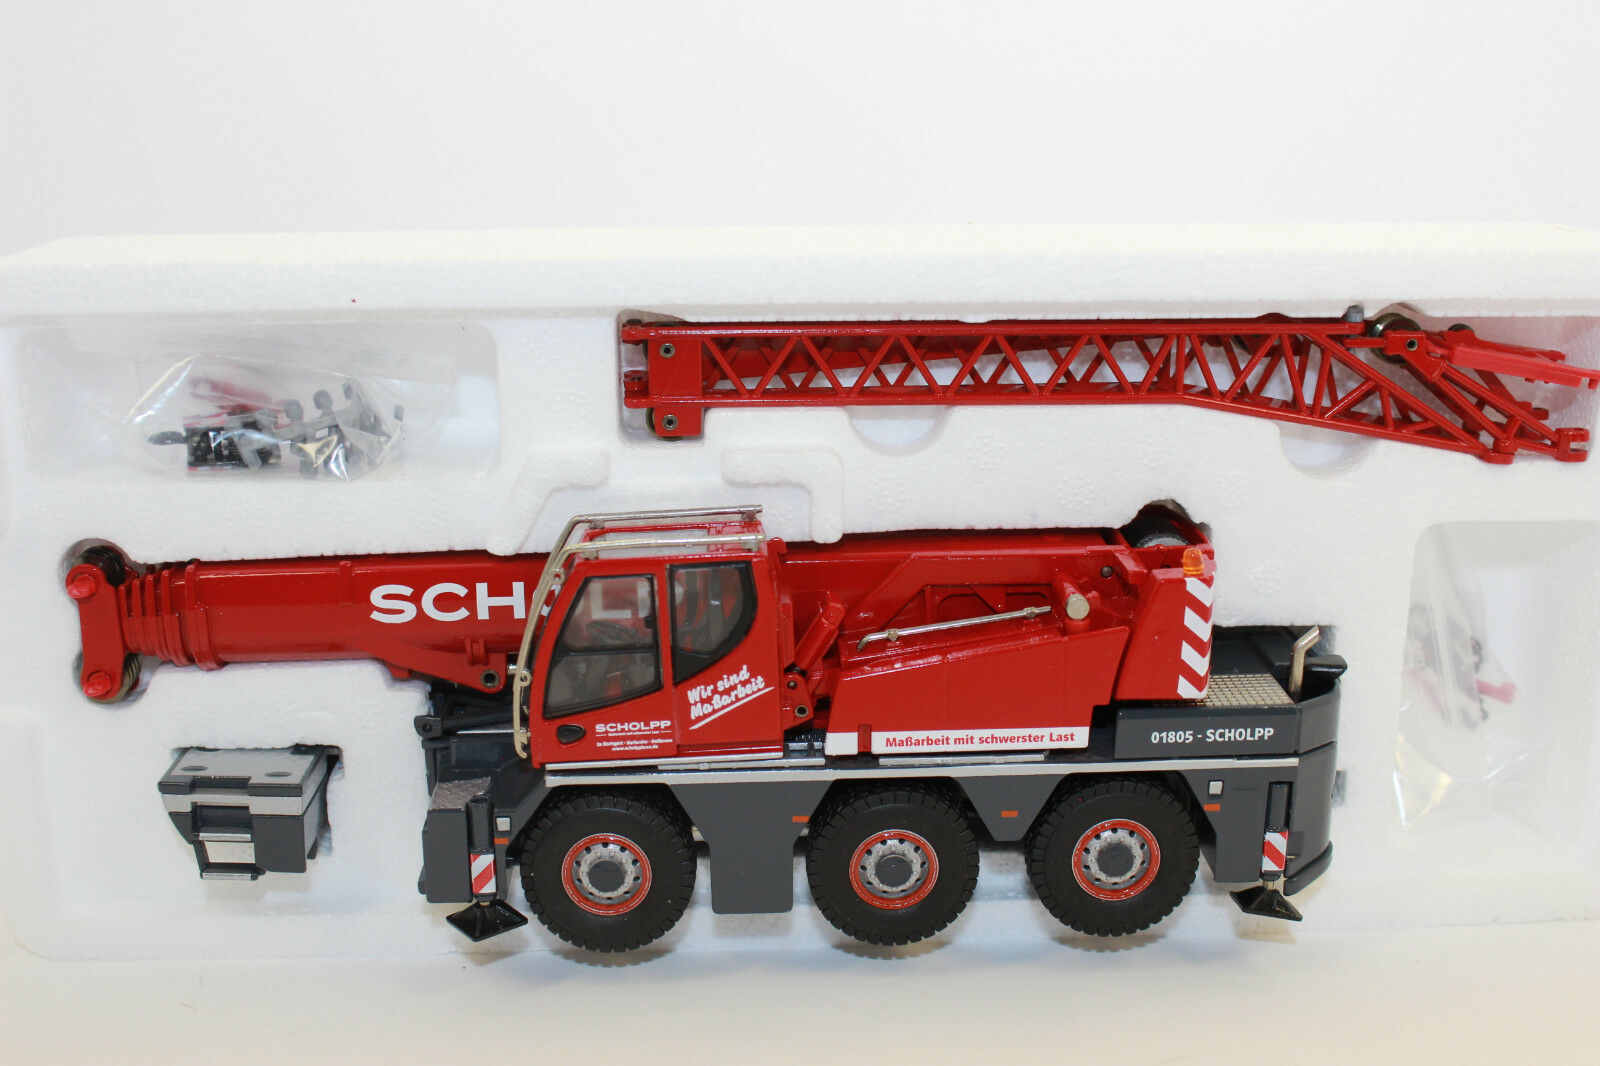 Kk Conrad 2109 Liebherr Ltc 1045-3.1 Scholpp Car Crane Mobile Crane 1 50 Nip Kk